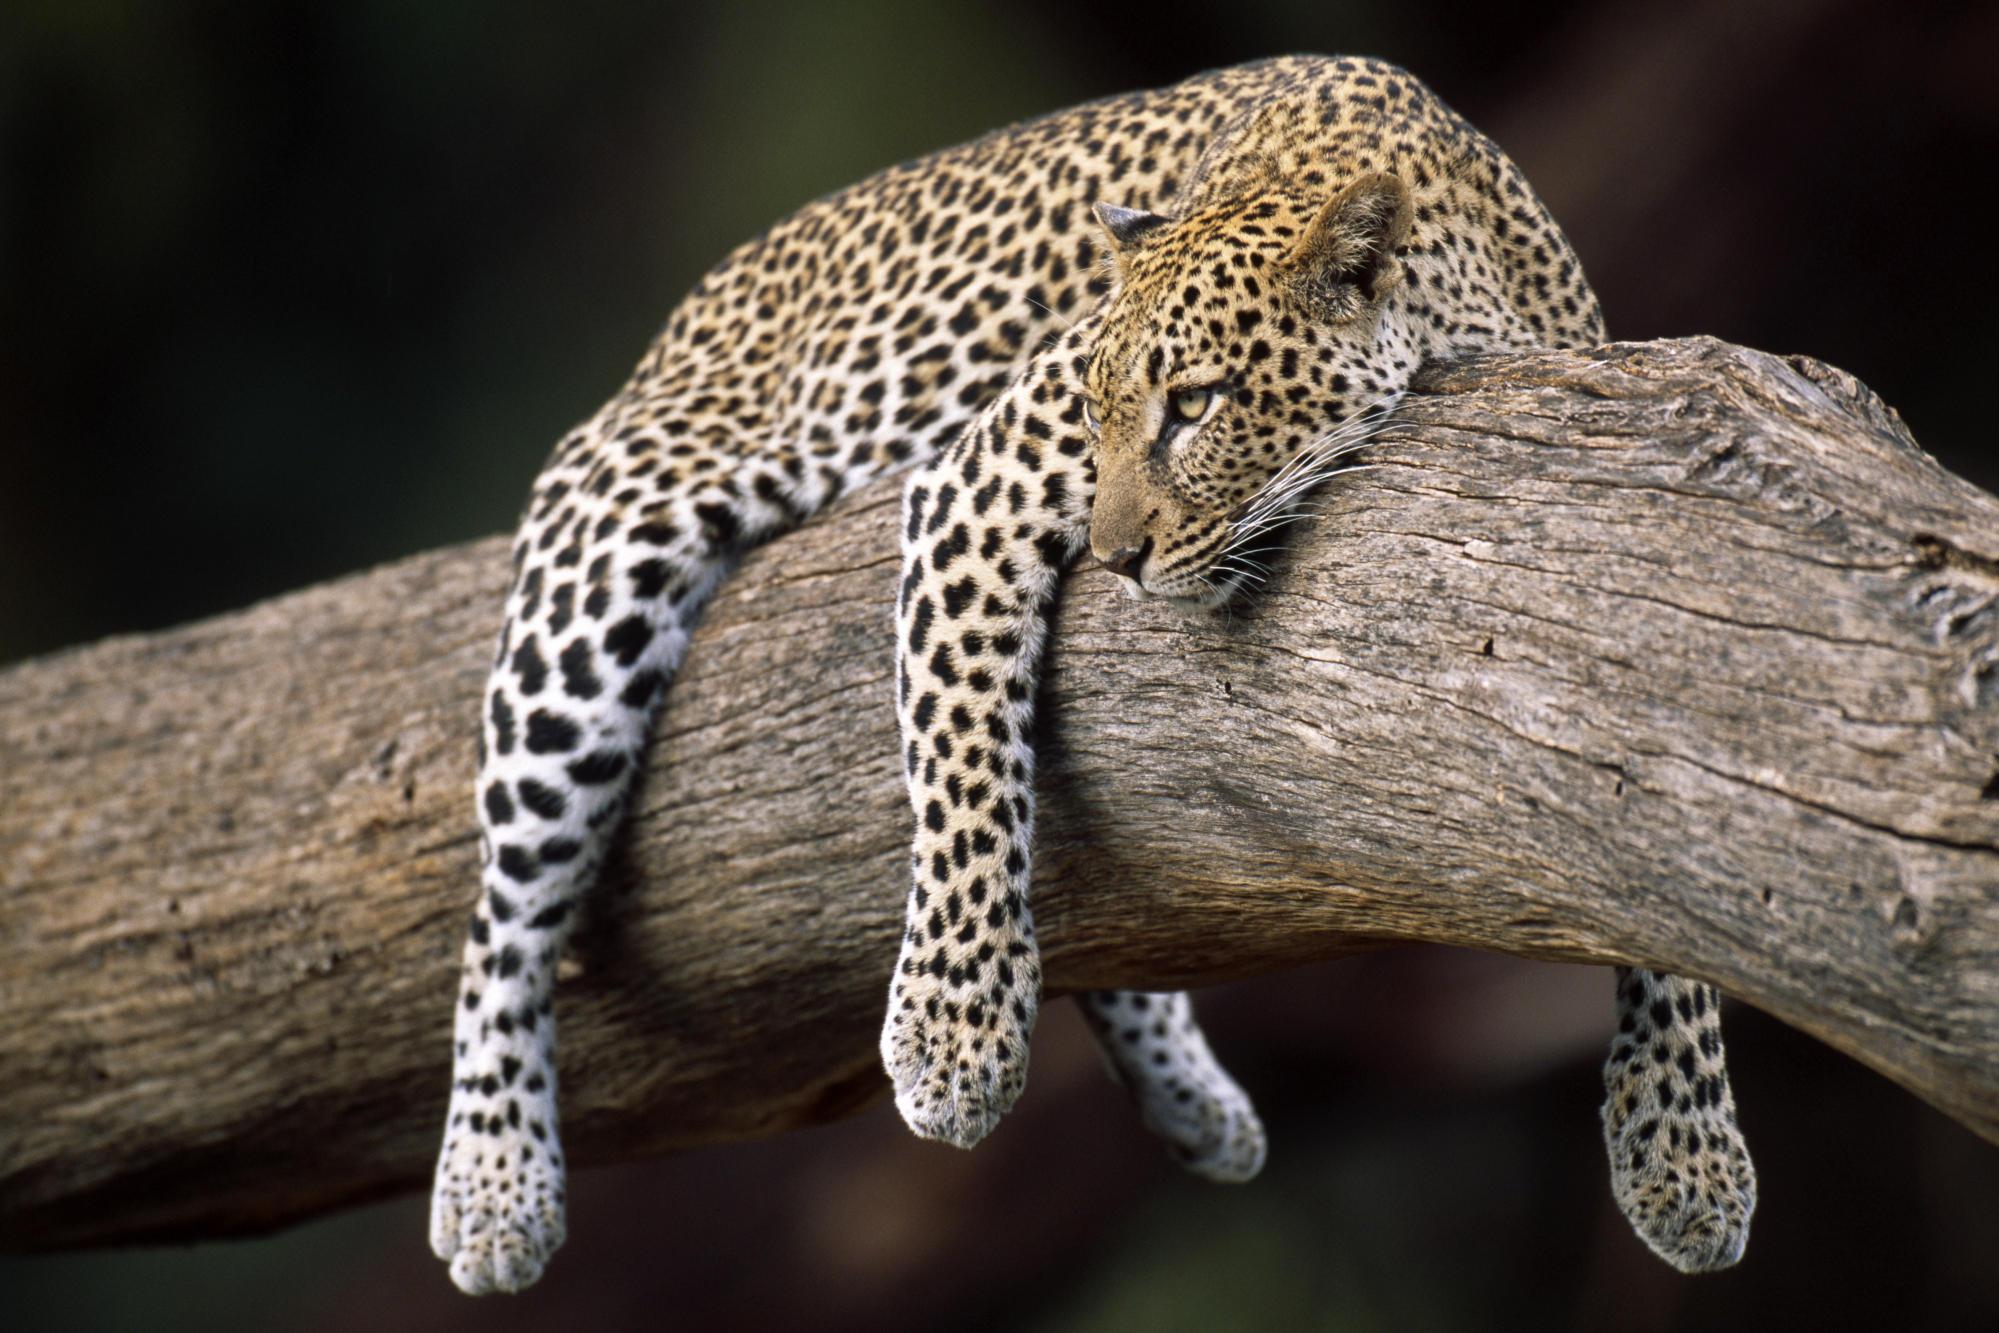 Sfondi animali hd per desktop ghepardo sfondi hd gratis for Sfondi animali hd